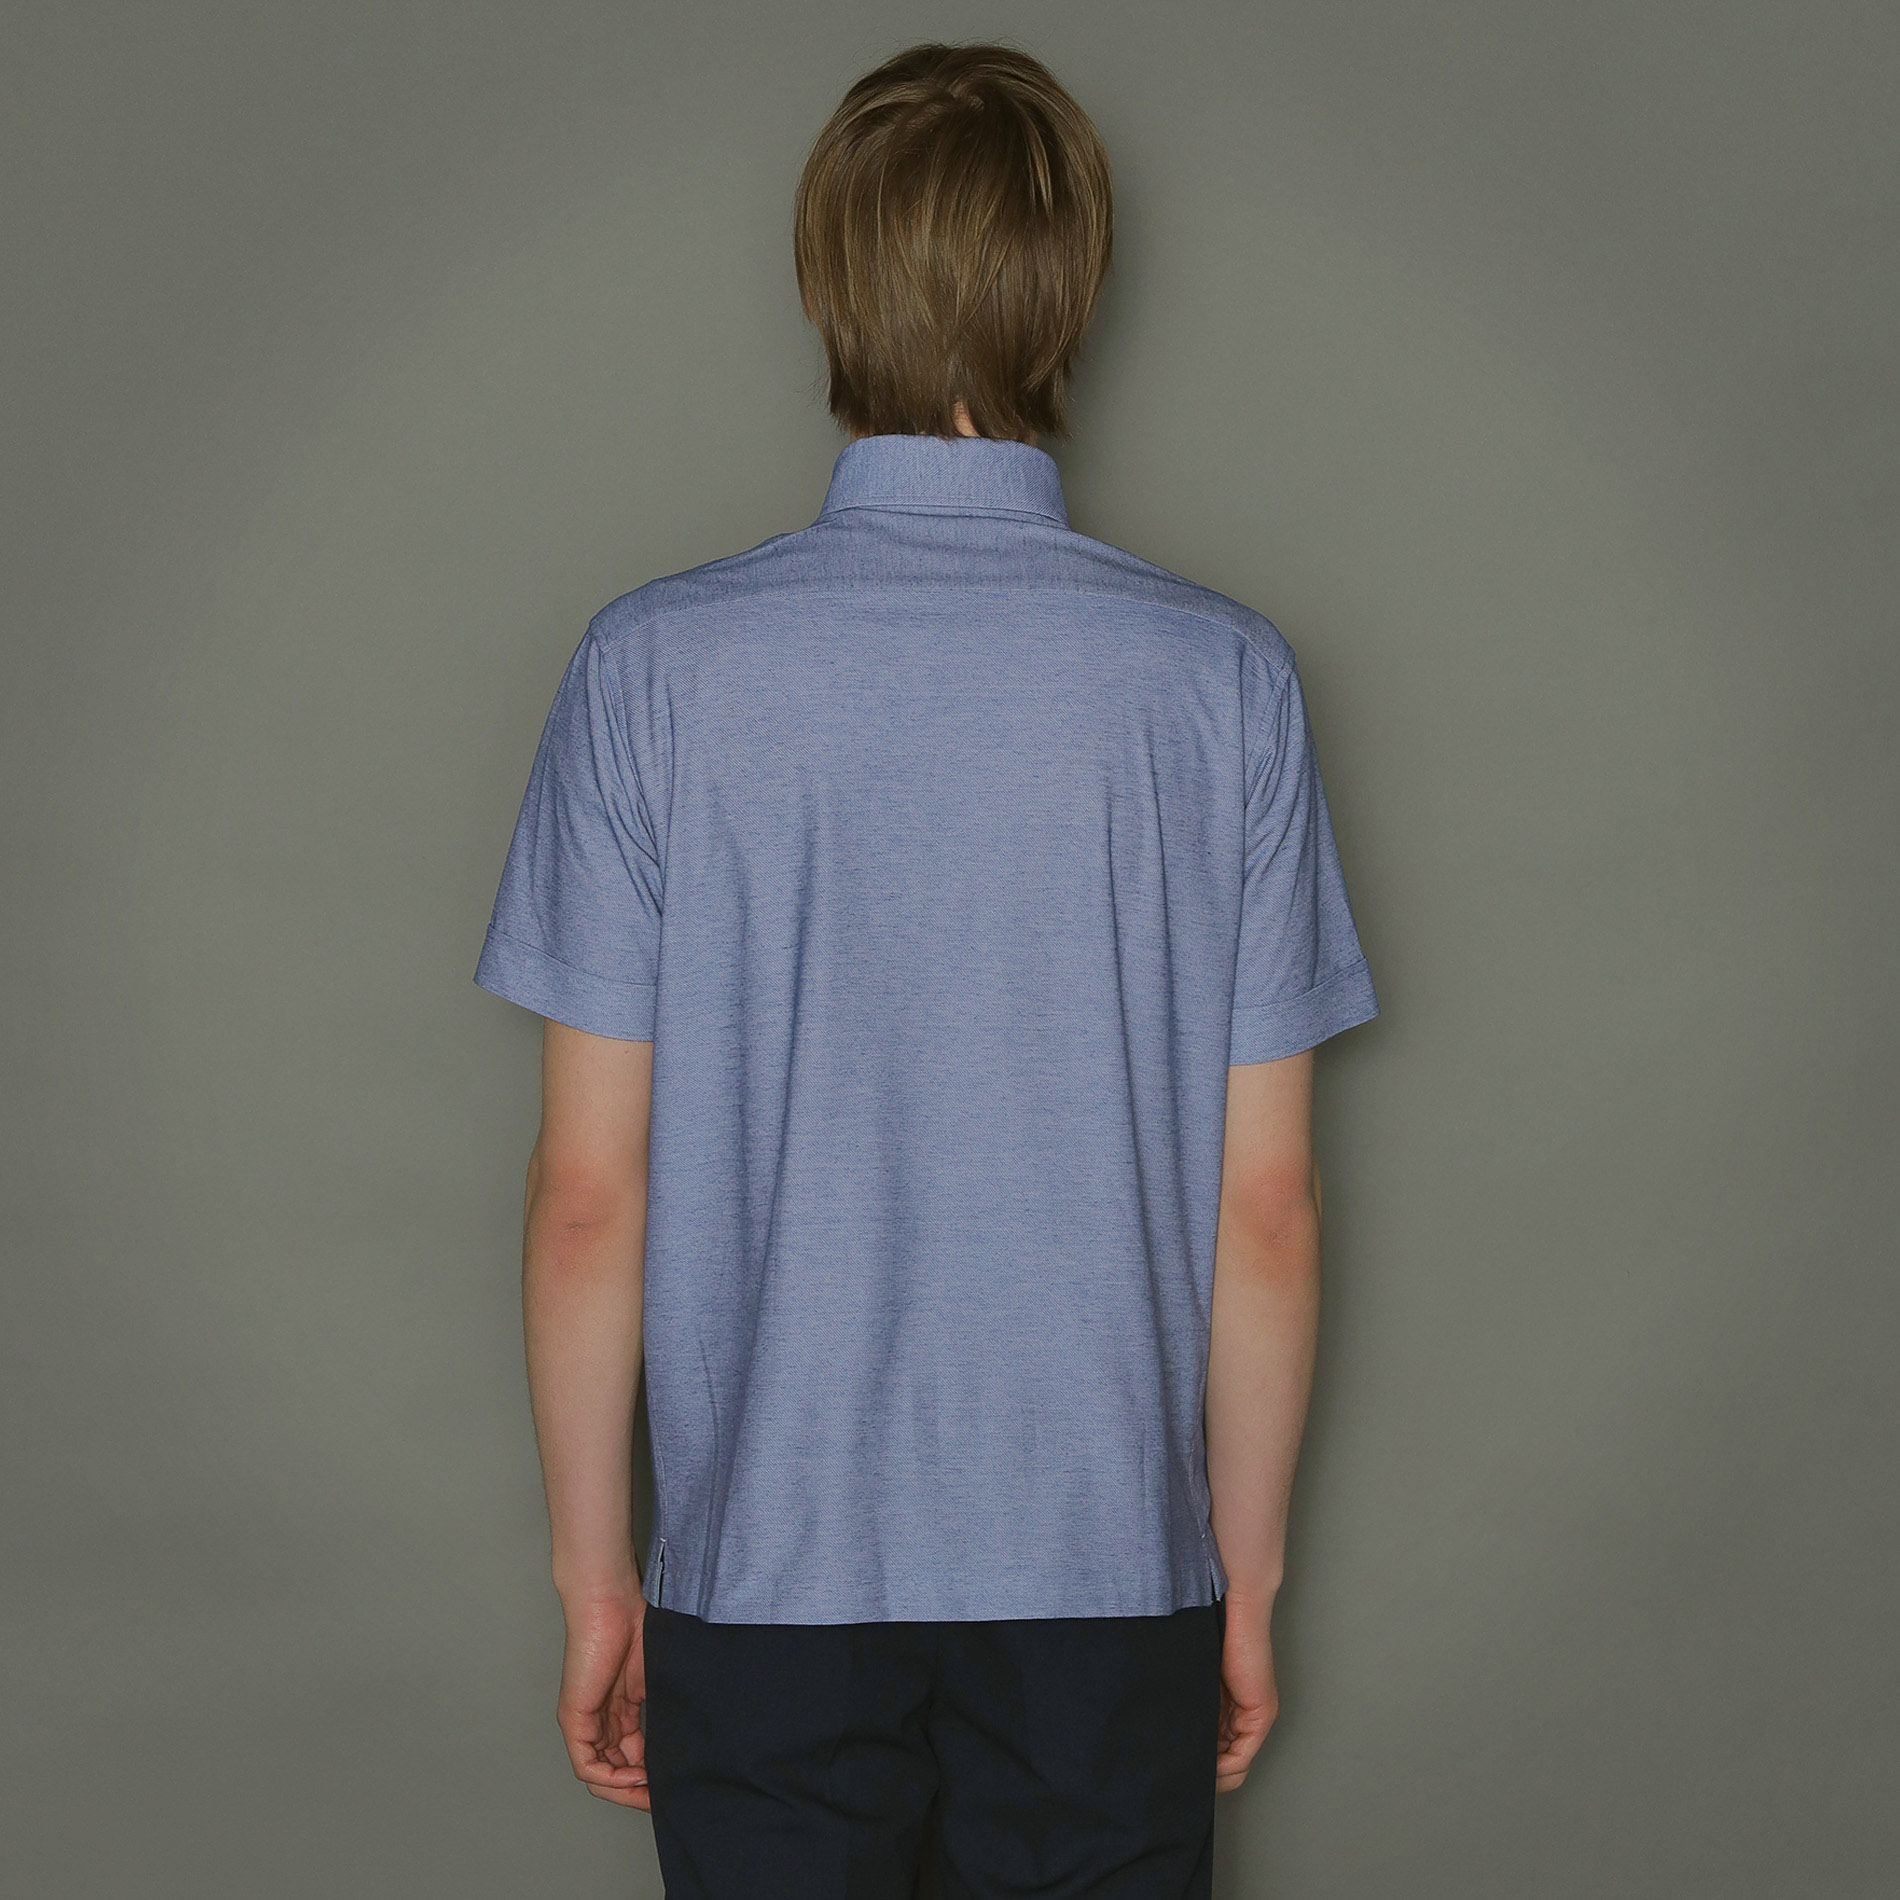 【FLEX JERSEY】デニム調ジャージドレスポロシャツ